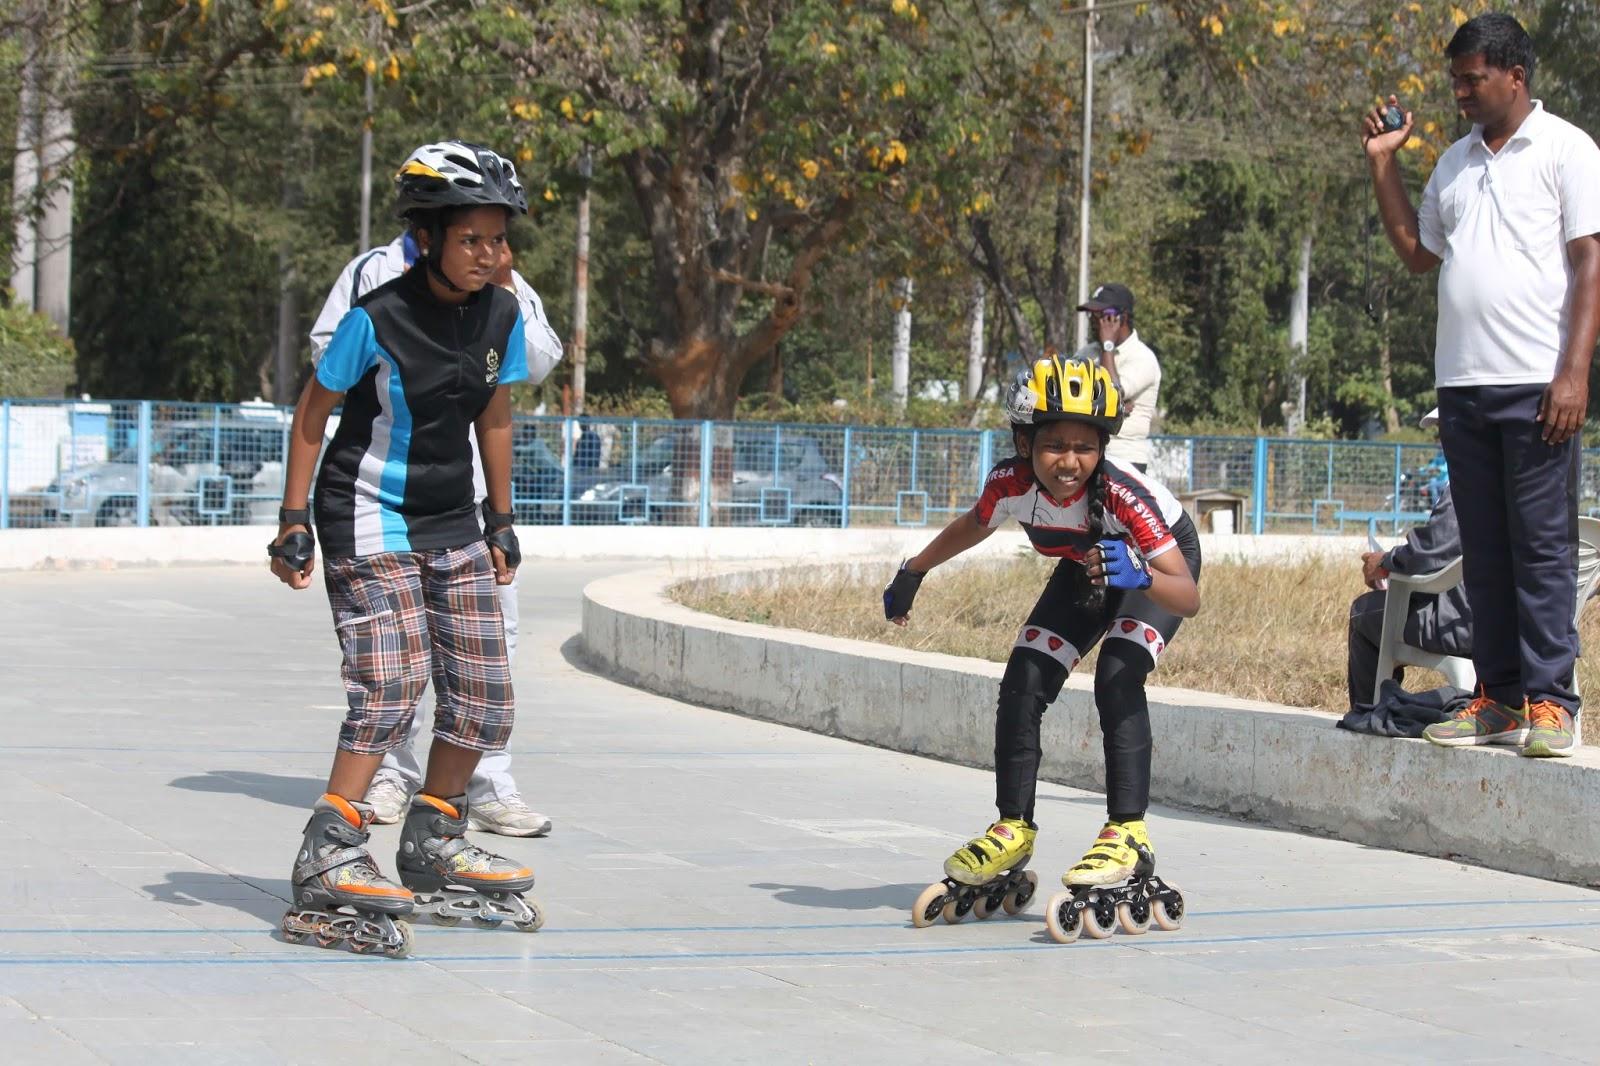 skating classes at madhapur in hyderabad skates for kids four wheel roller skate cheap rollerblads toddler skates childrens skates